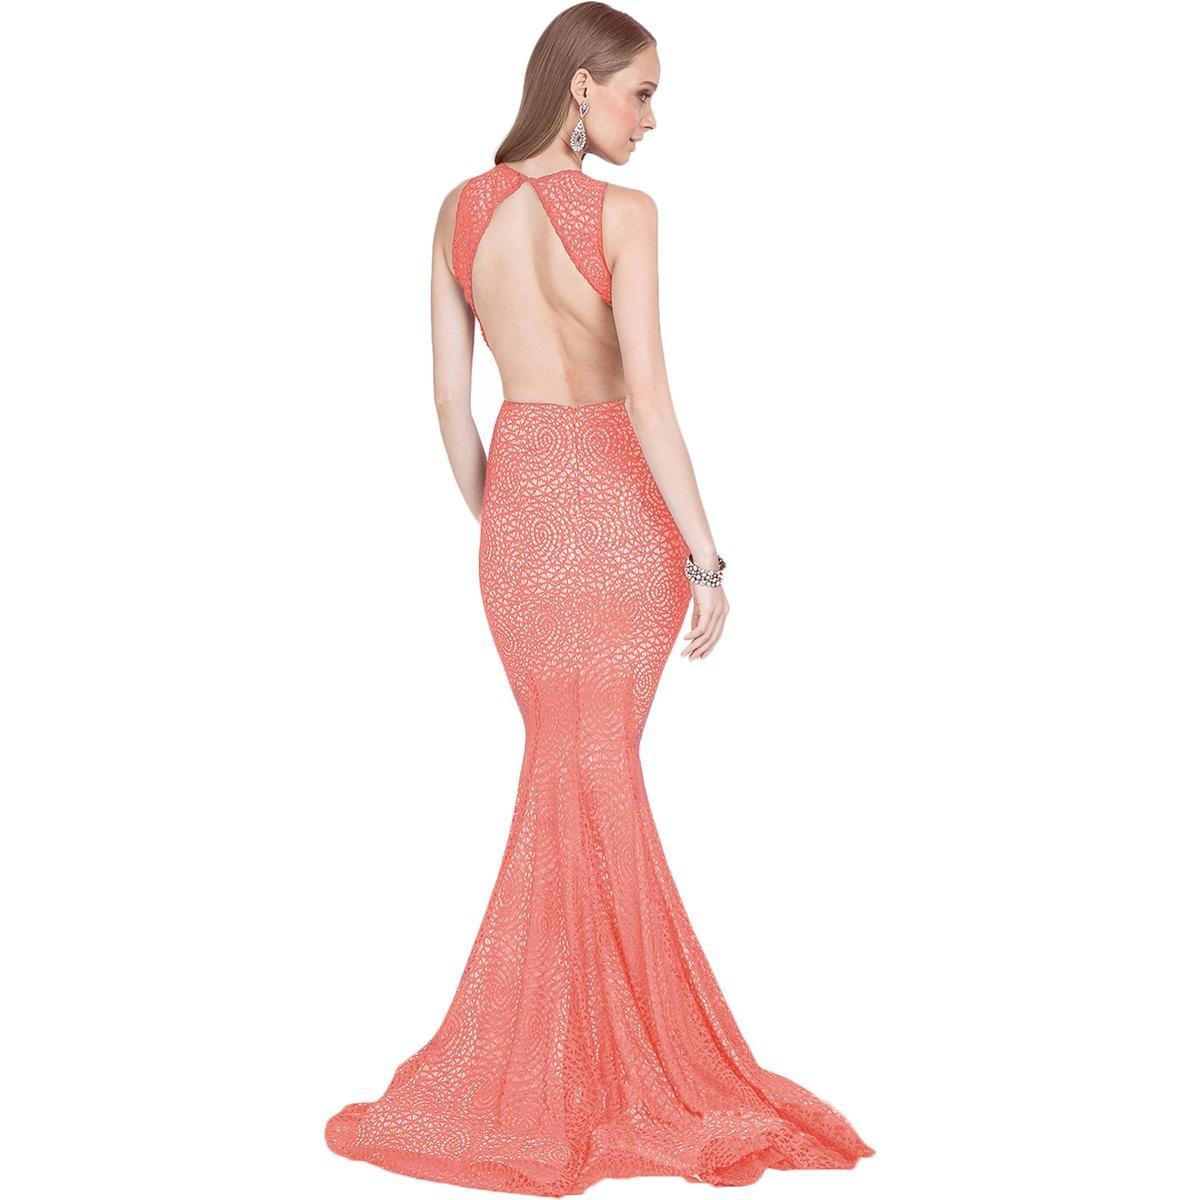 Terani Couture Lace Rhinestone Formal Dress